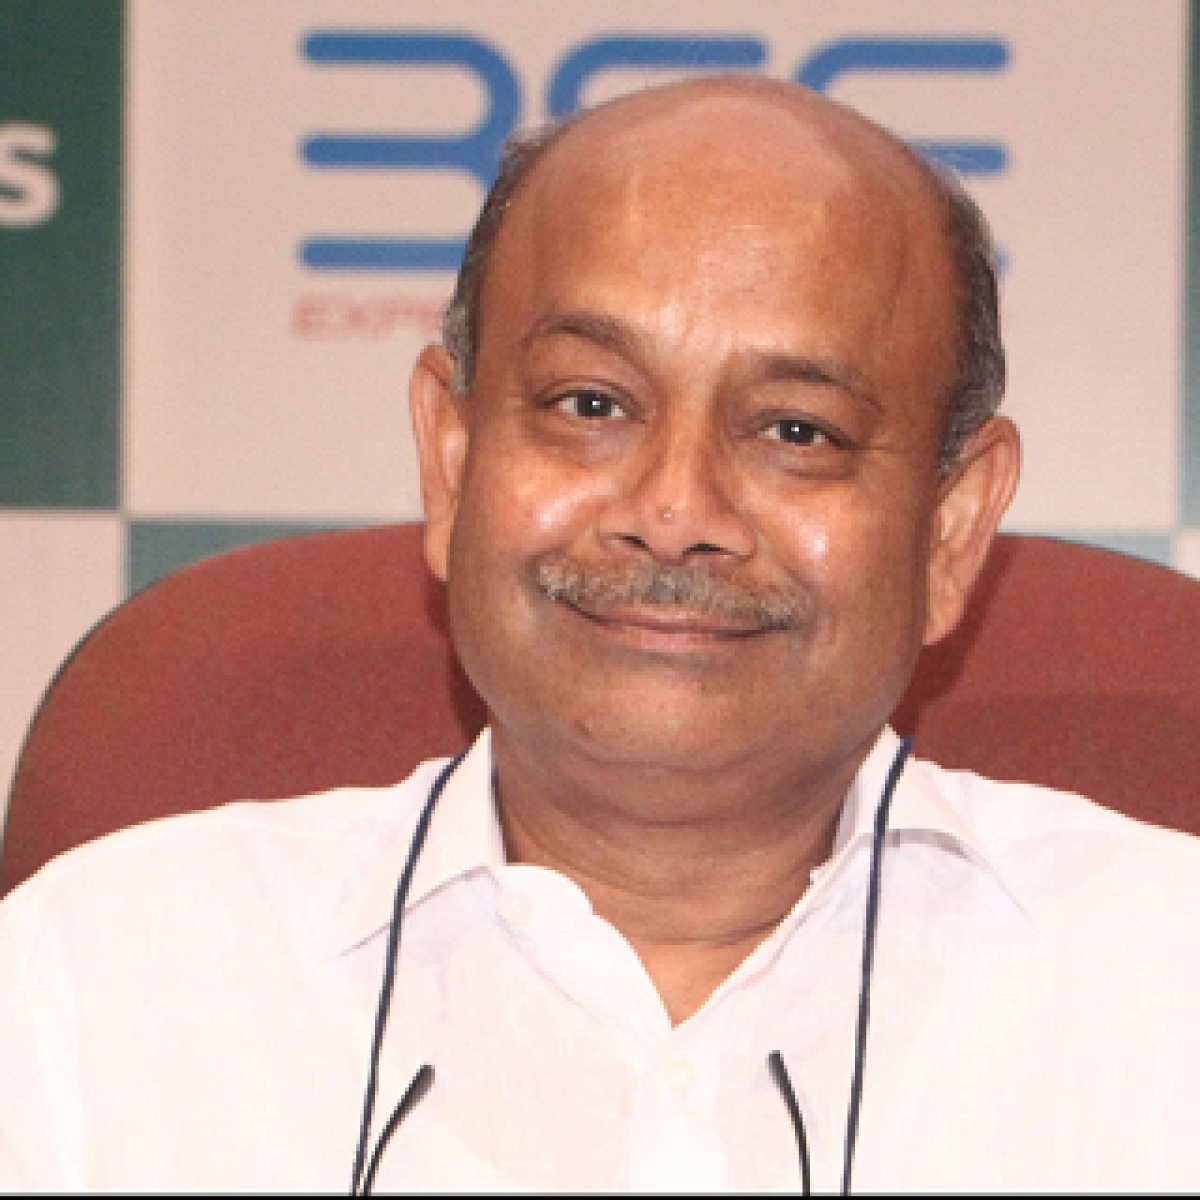 D-Mart founder Radhakishan Damani buys property worth Rs 1,001 cr in South Mumbai's Malabar Hill